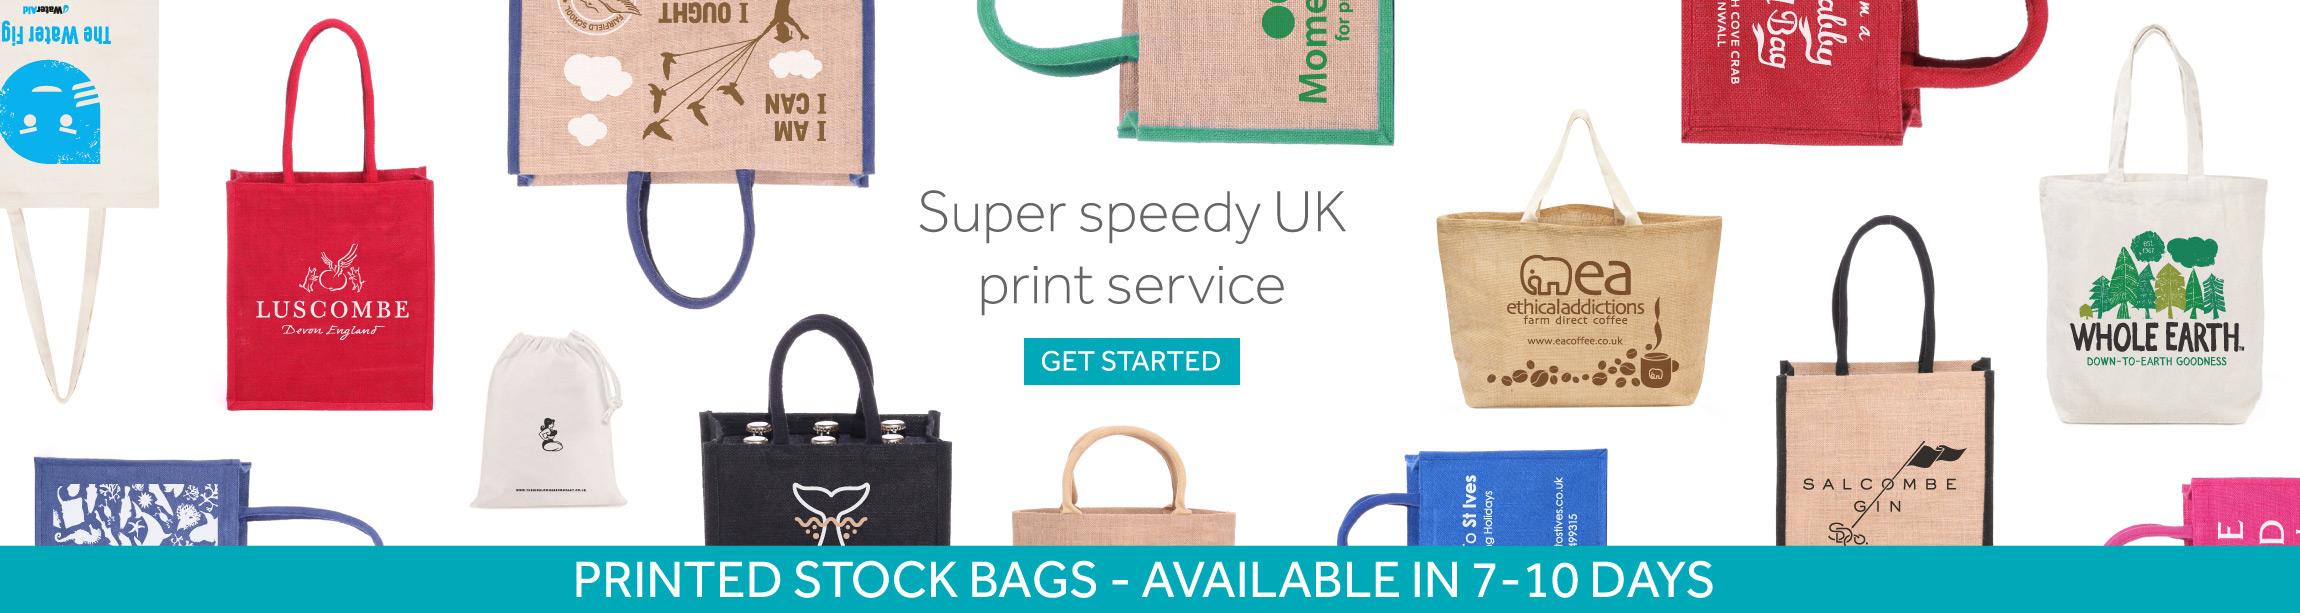 Super speedy UK print service